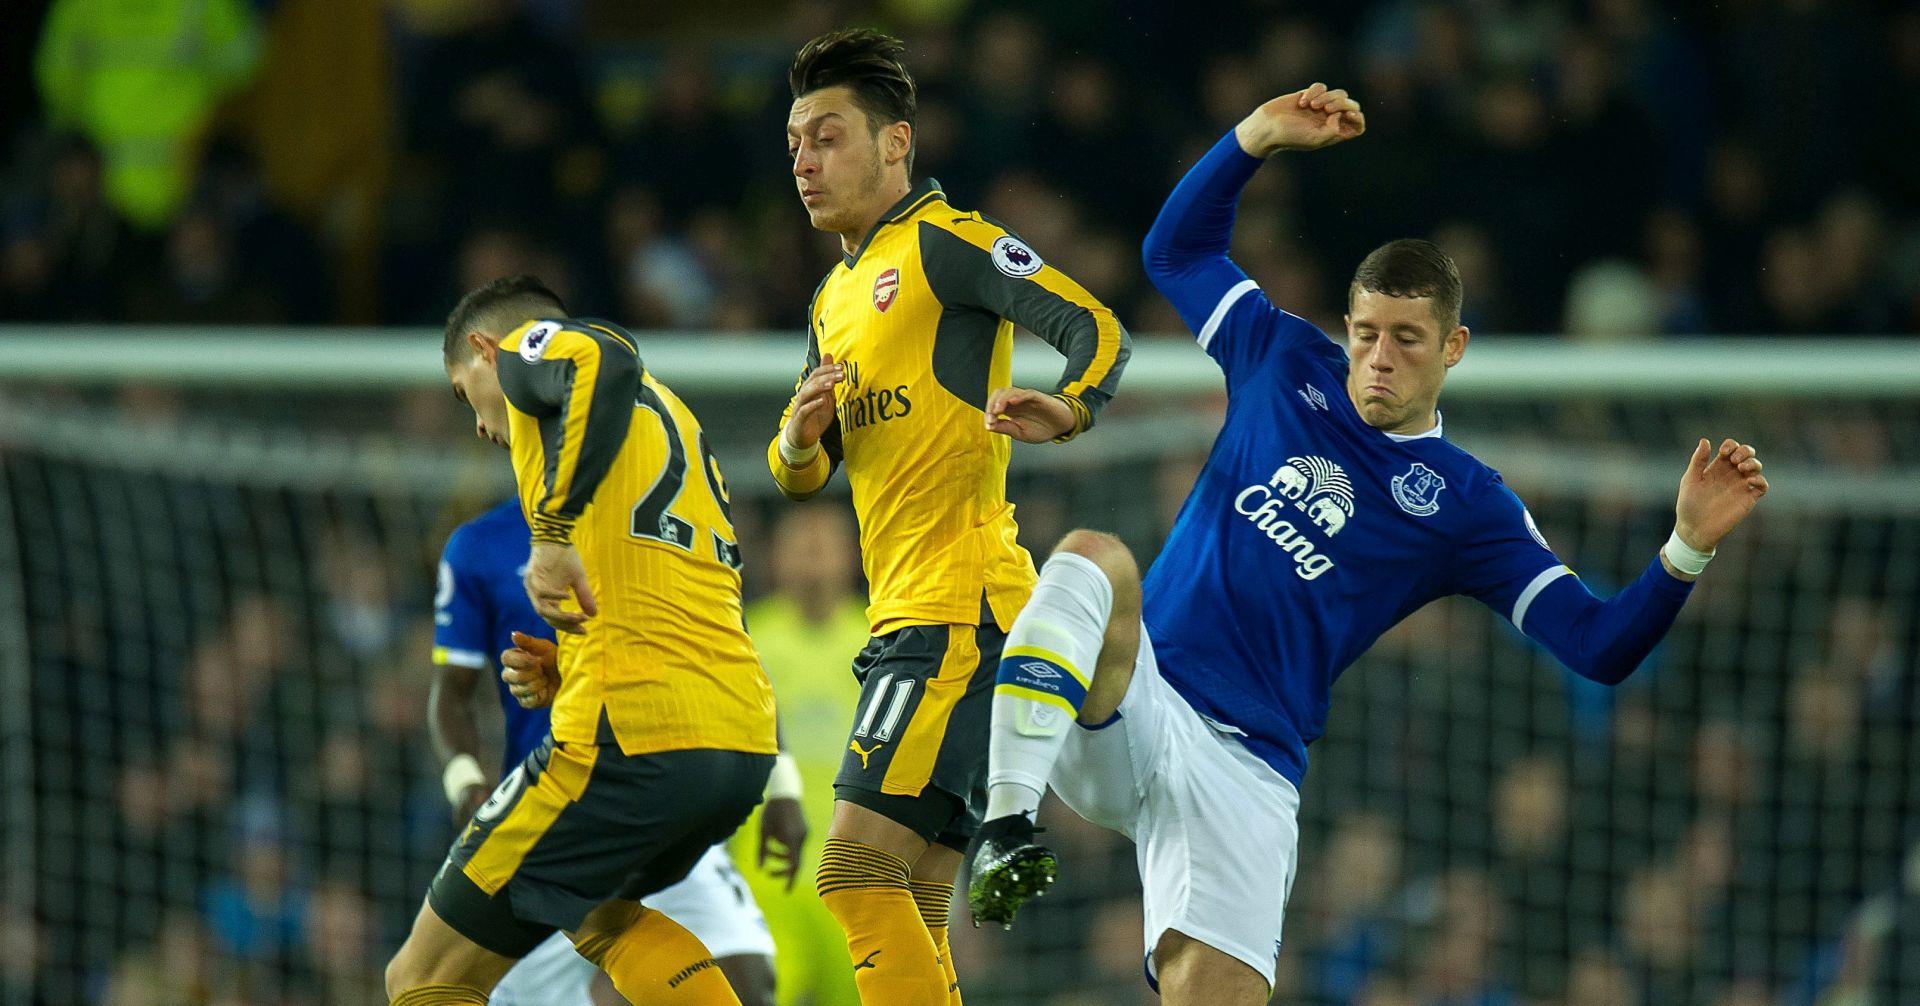 PREMIERLIGA Prvi poraz Arsenala nakon 13 utakmica, Leicester izgubio kod Bournemoutha